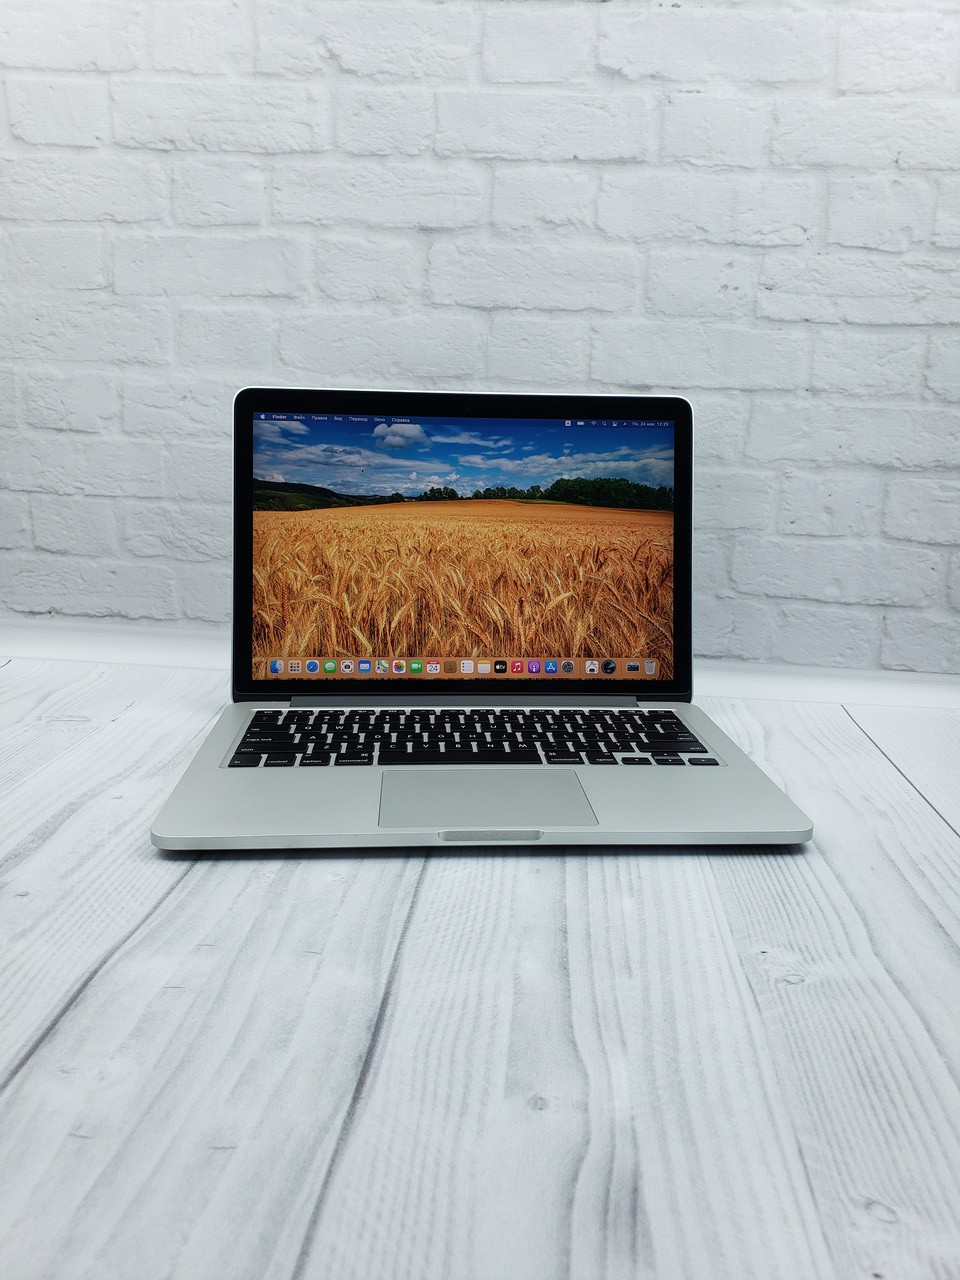 MacBookPro13,3'Early2015MF839SSD256 Gb8Gb RAMМагазин Гарантия